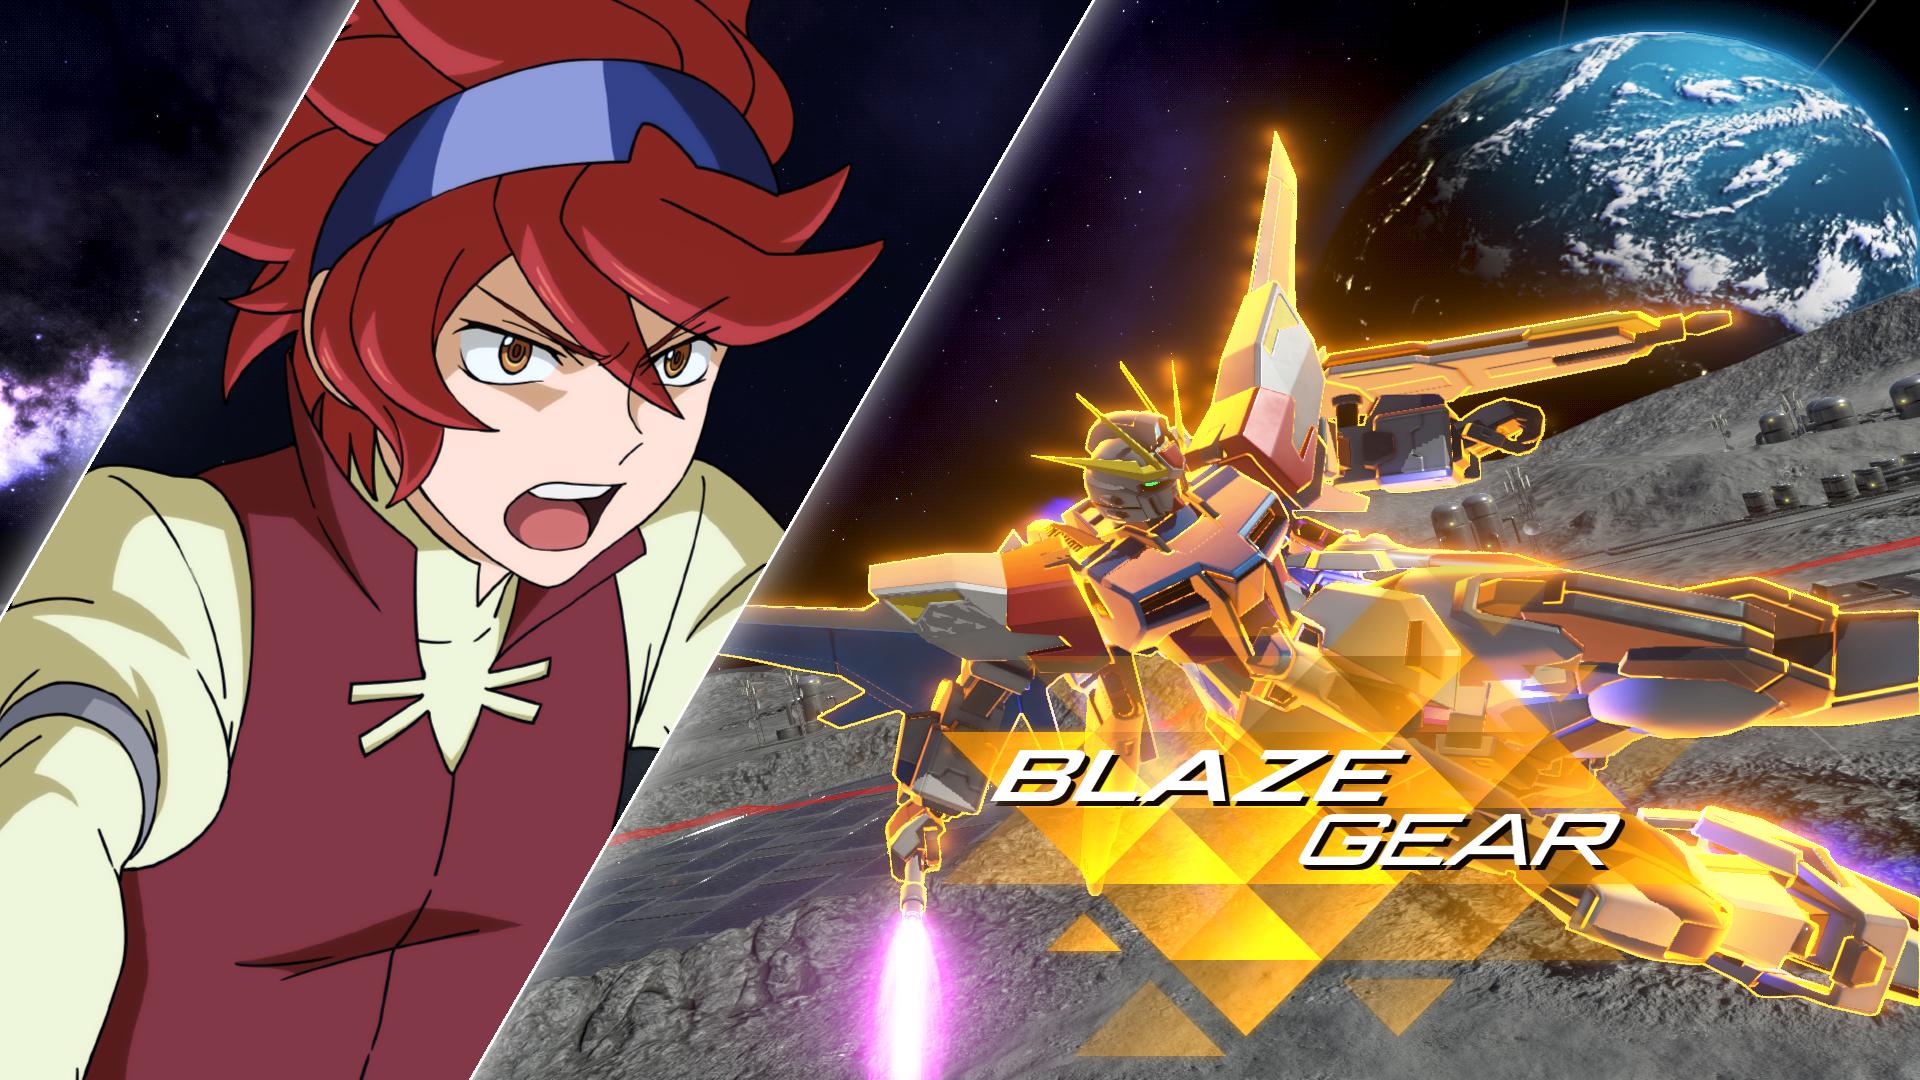 Gundam Versus に ビルドストライクガンダム フルパッケージ と ファルシア の参戦が決定 Game Watch